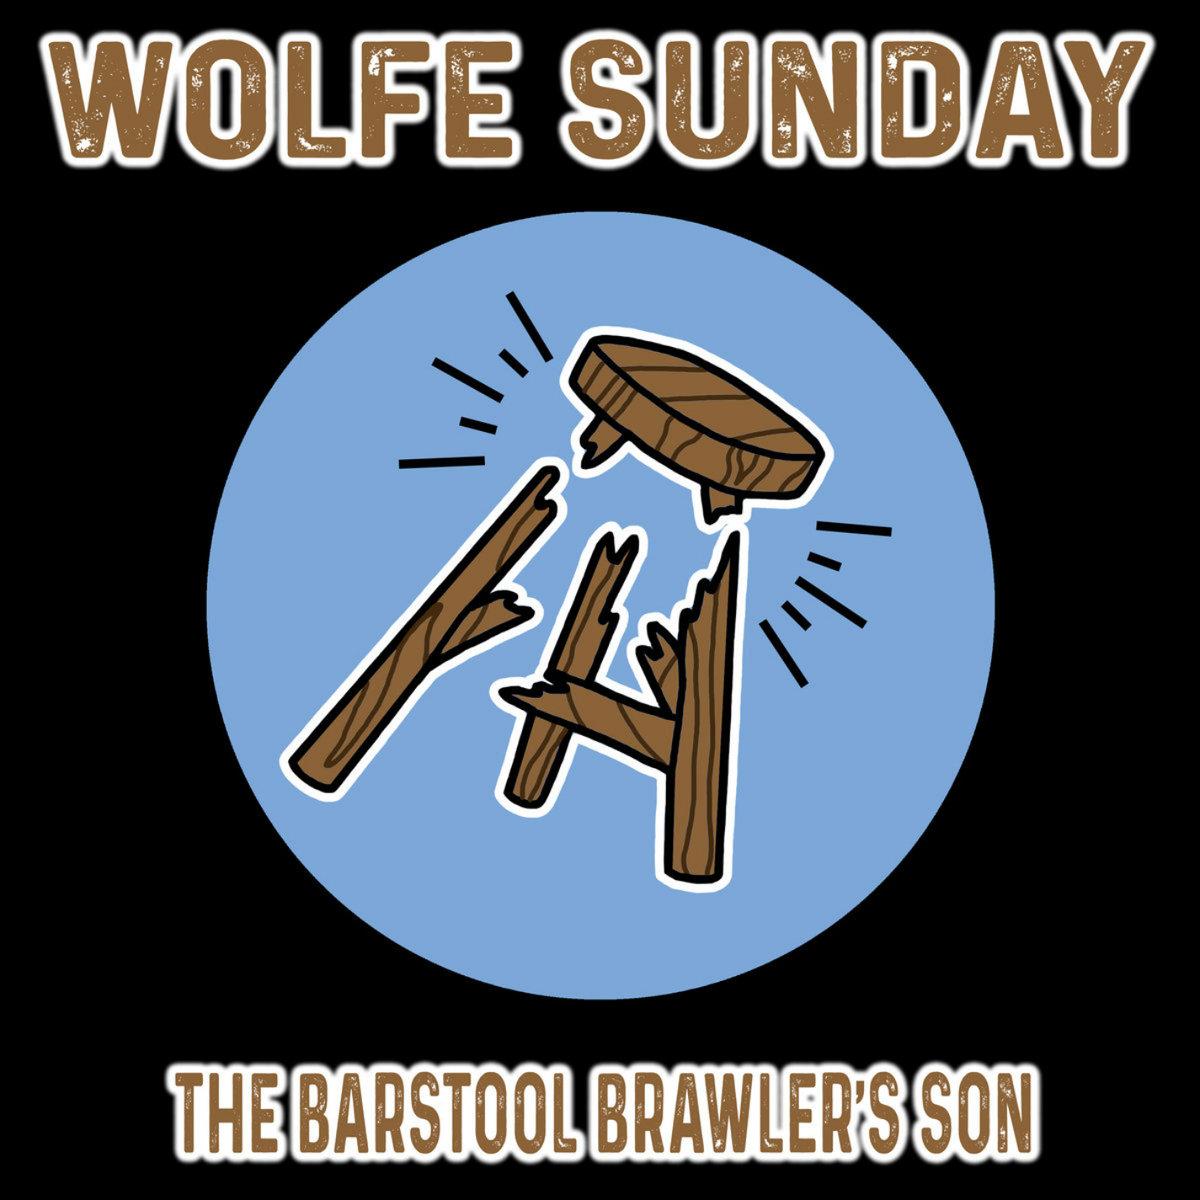 Wolfe Sunday - Barstool Brawler's Son